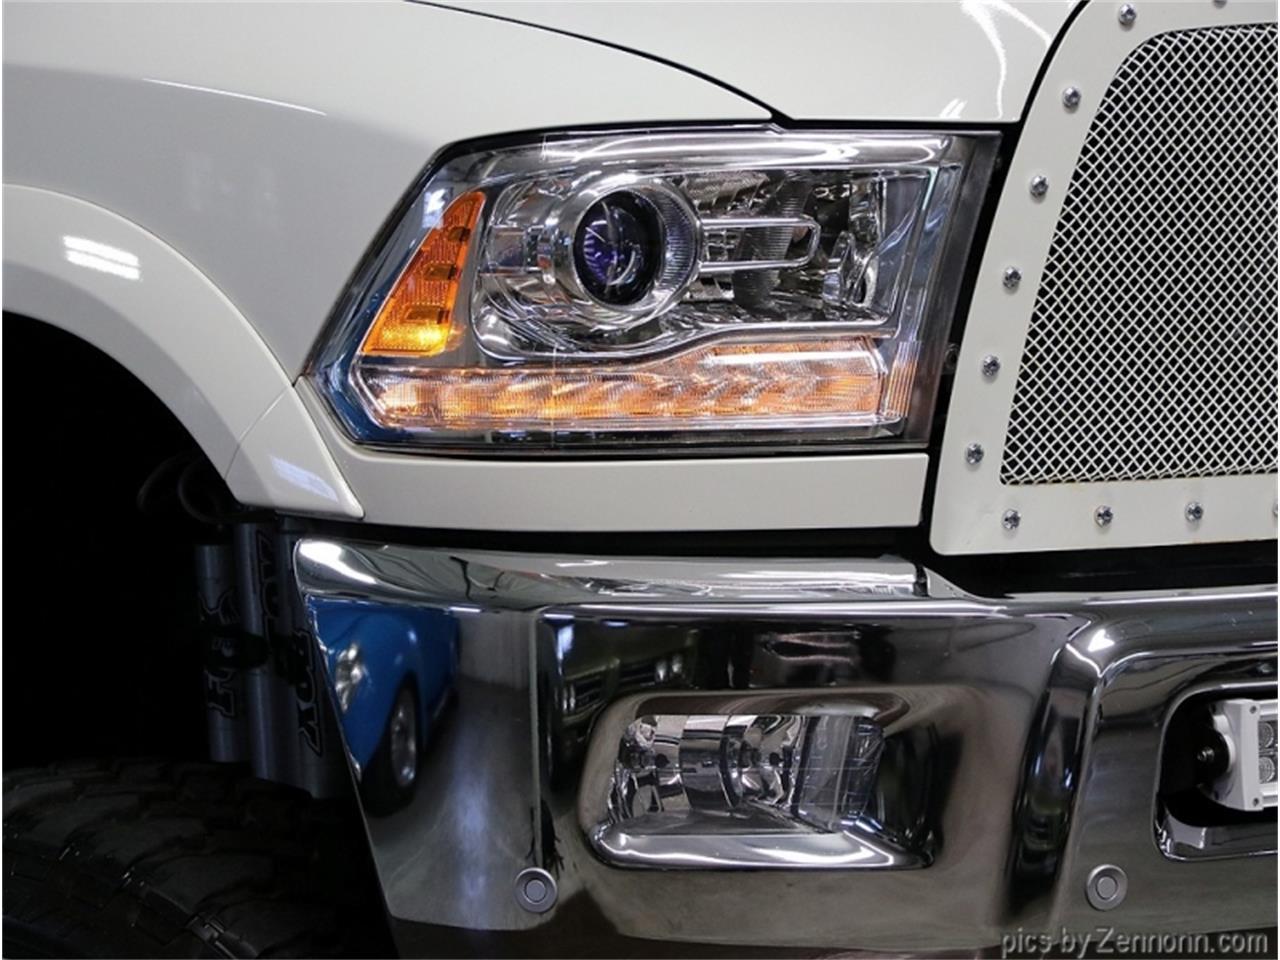 2018 Dodge Ram 2500 (CC-1379557) for sale in Addison, Illinois